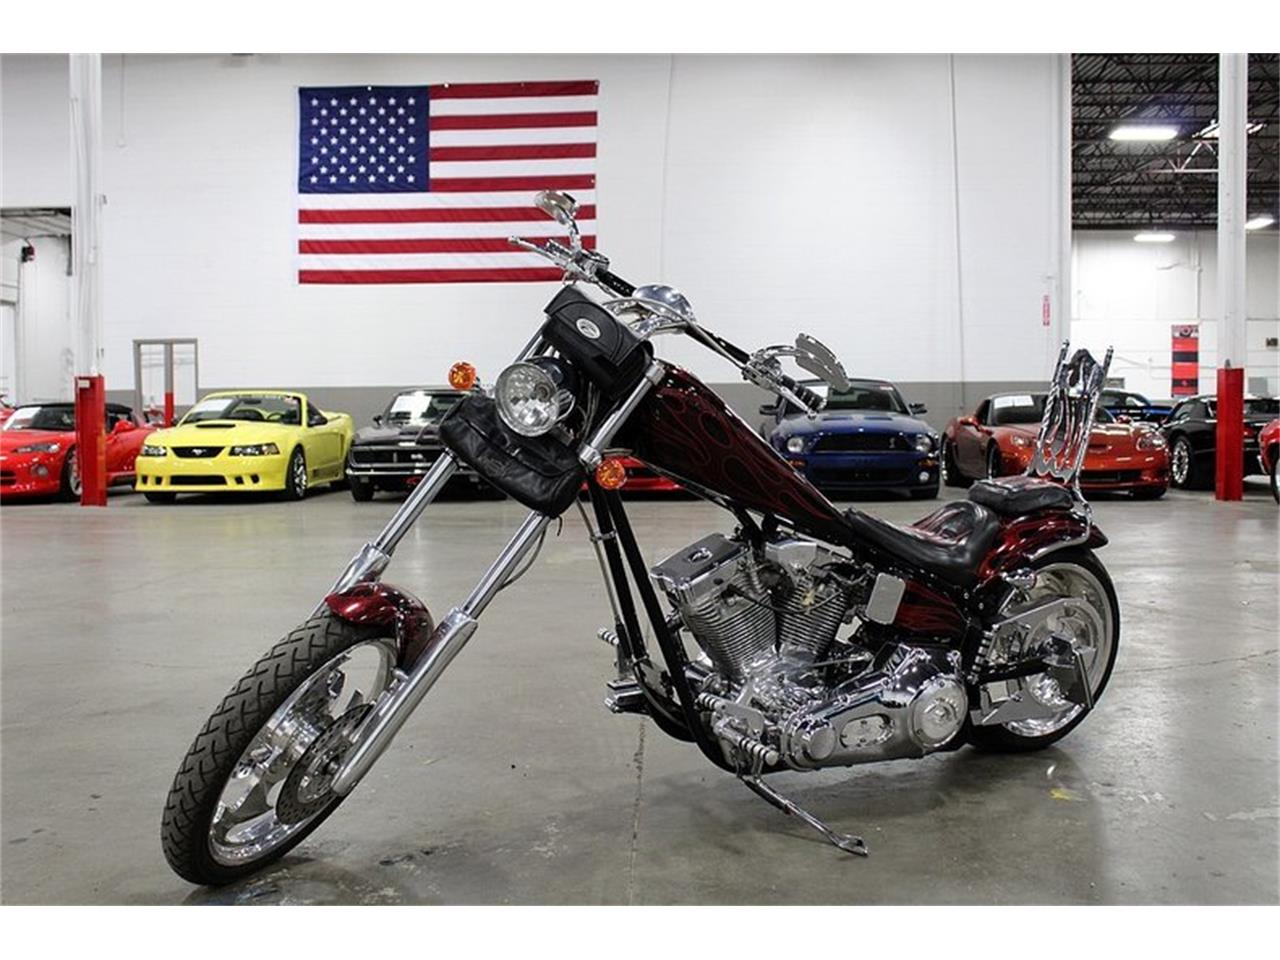 For Sale: 2003 American Ironhorse Texas Chopper in Kentwood, Michigan